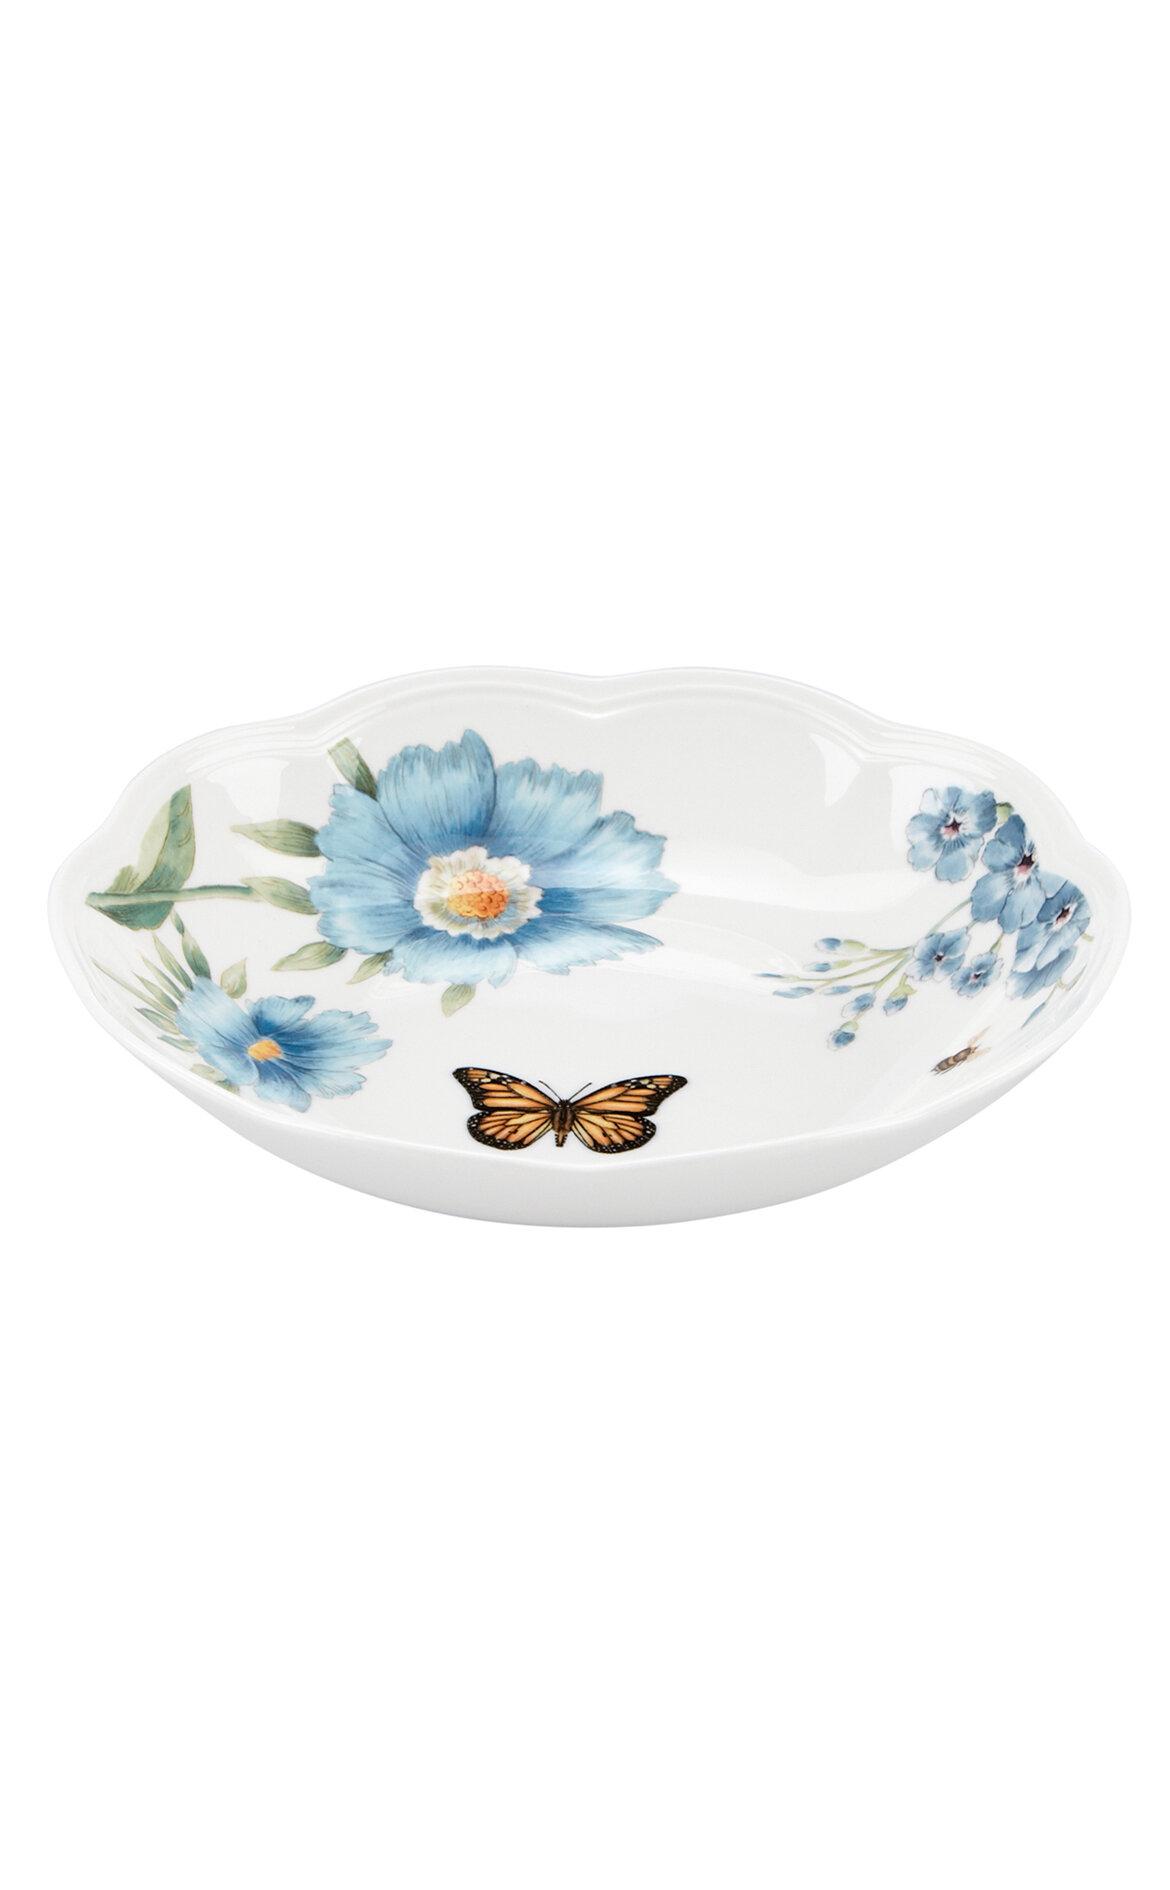 Lenox-Lenox Blue Butterfly Çukur Tabak